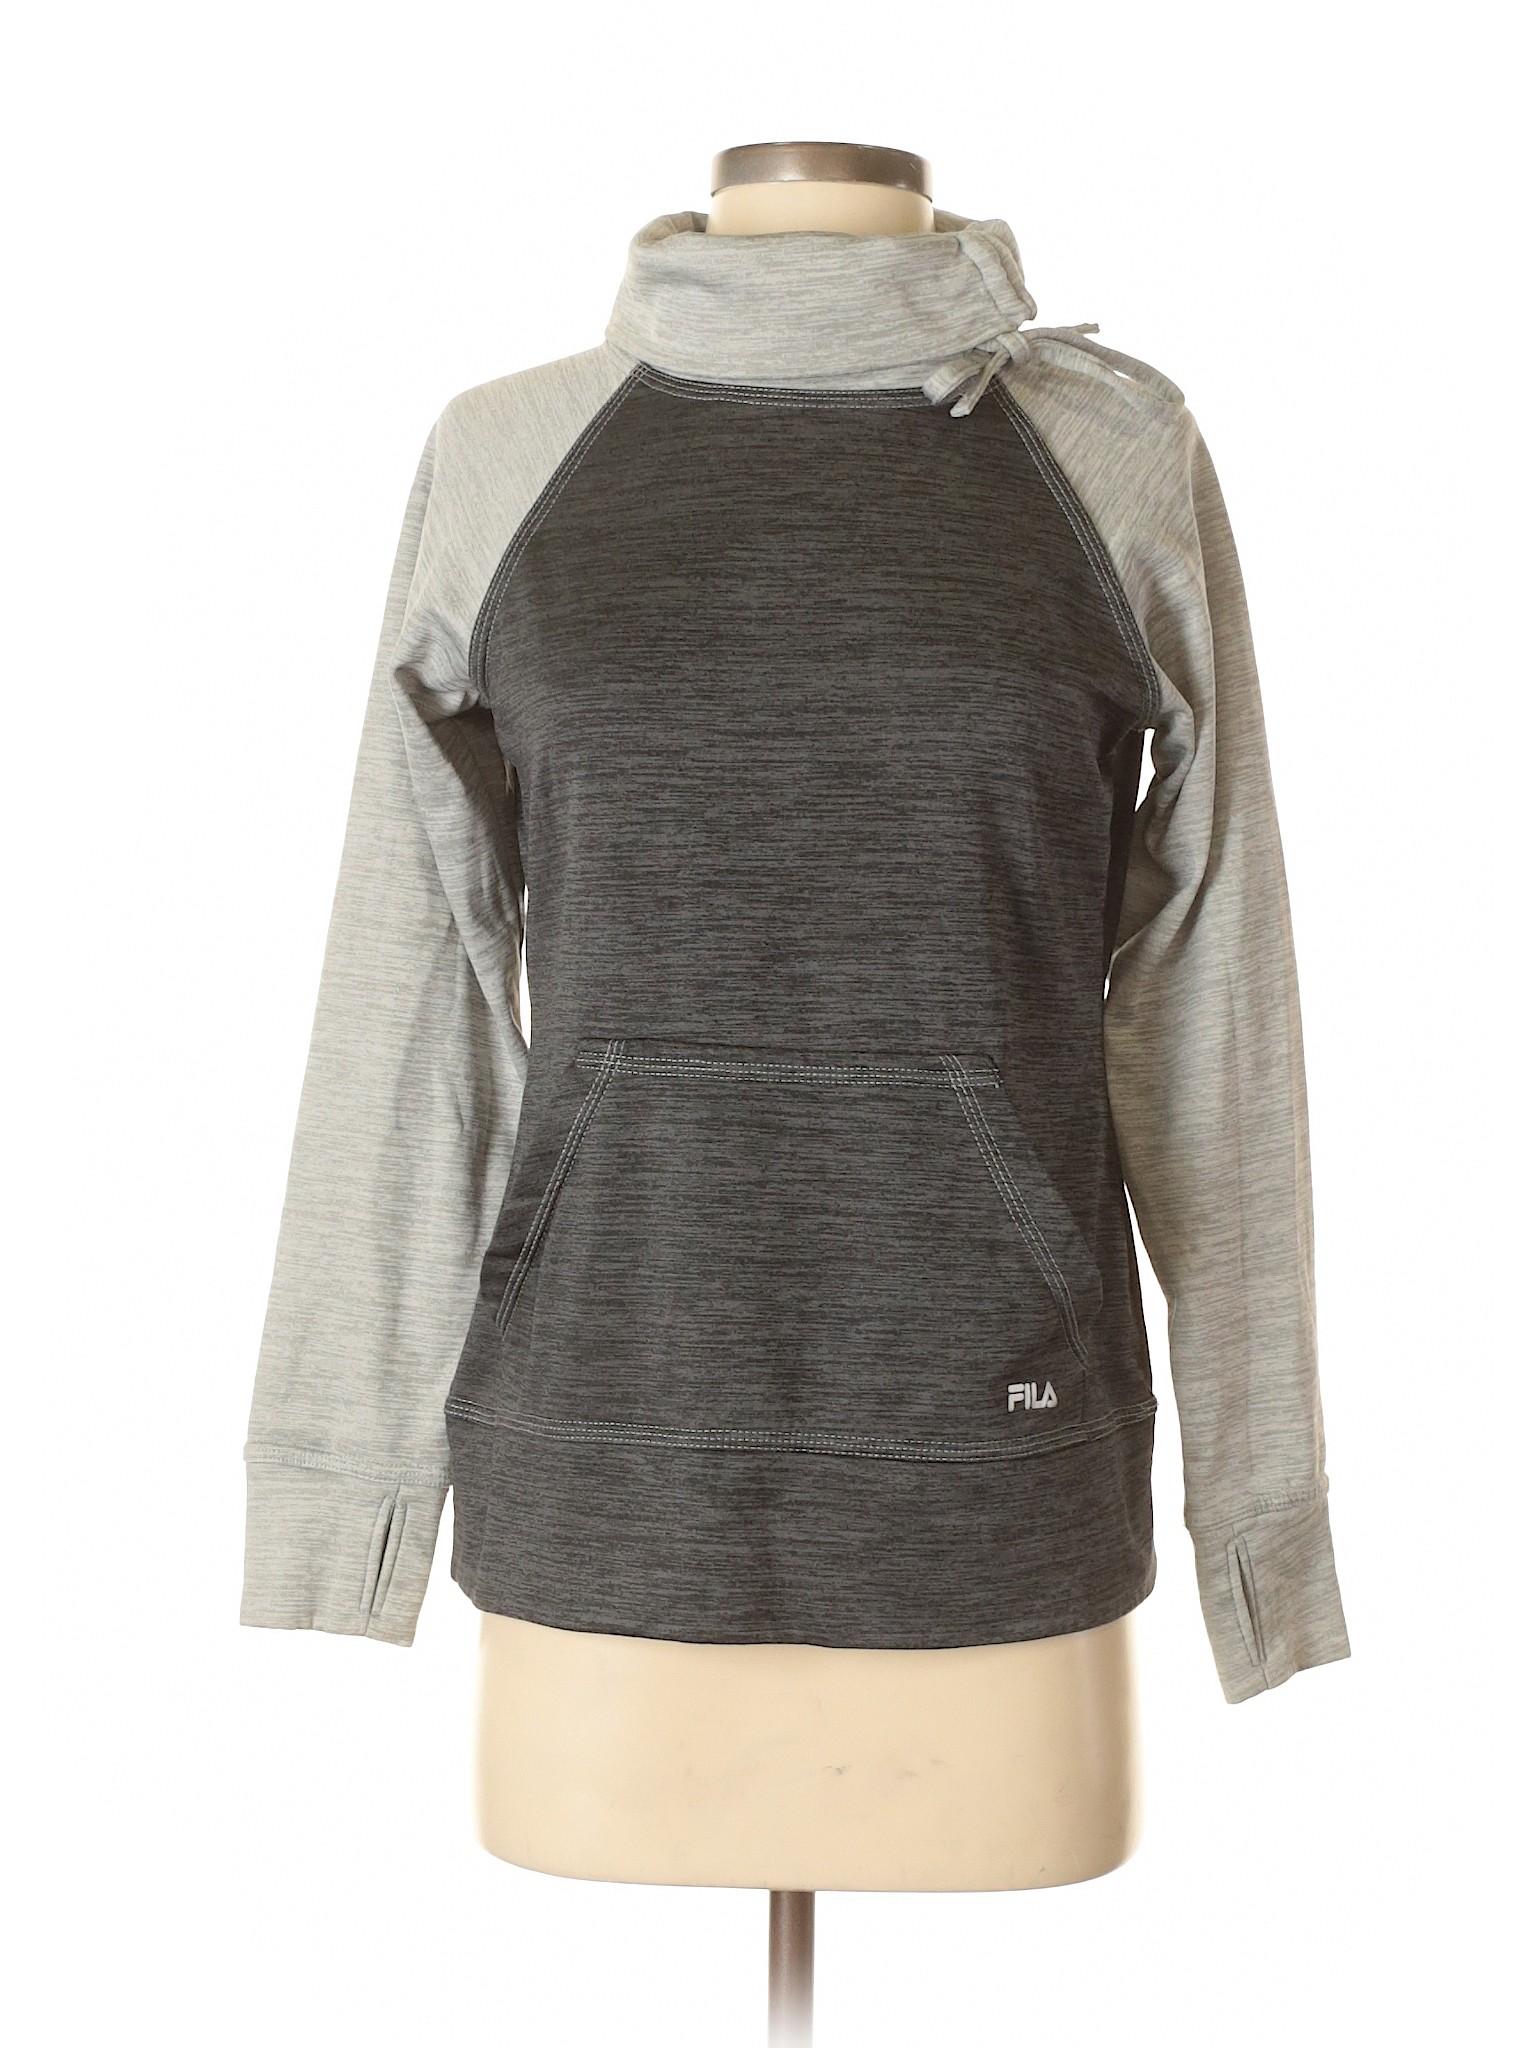 Pullover Fila Boutique Boutique Sweater Fila 6HKtUqKw0